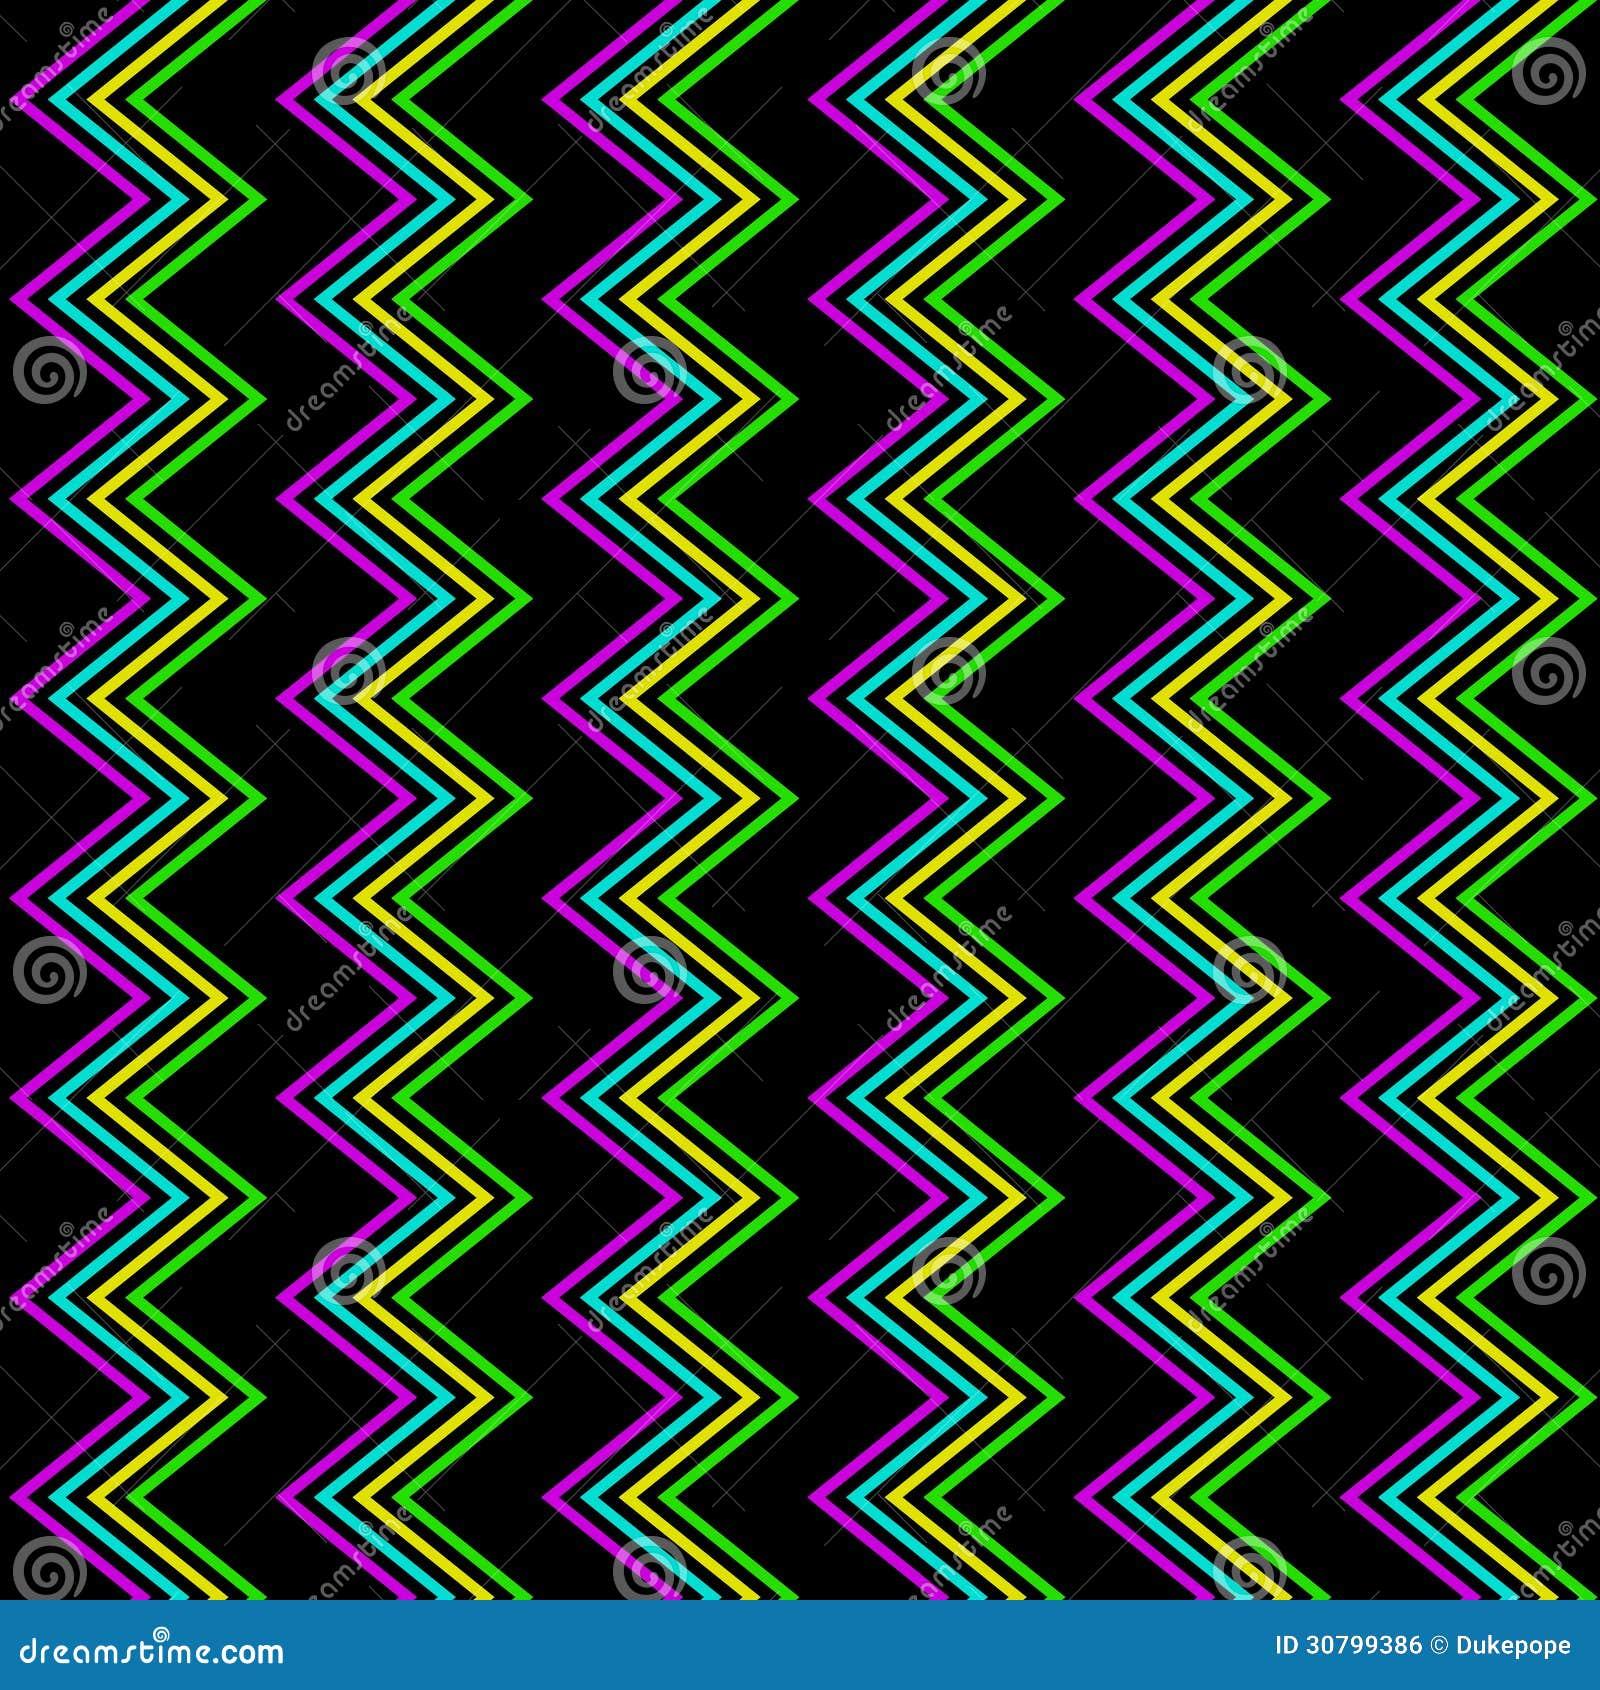 funky zig zag pattern stock vector image of fashion 30799386. Black Bedroom Furniture Sets. Home Design Ideas